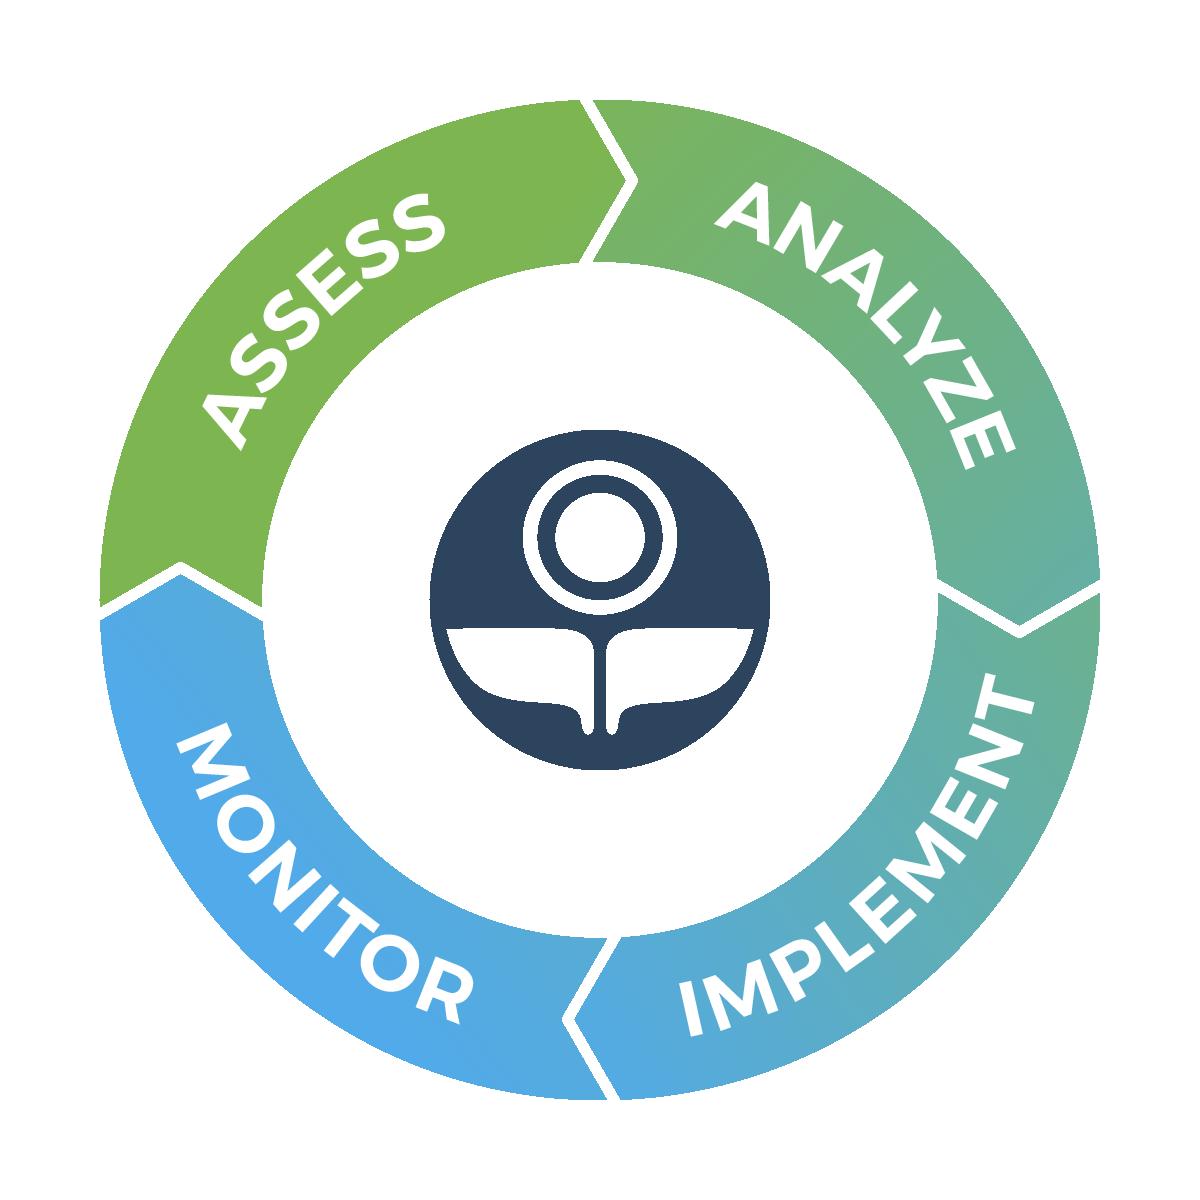 Vibrant Planet Assess-Analyze-Implement-Monitor Services Diagram